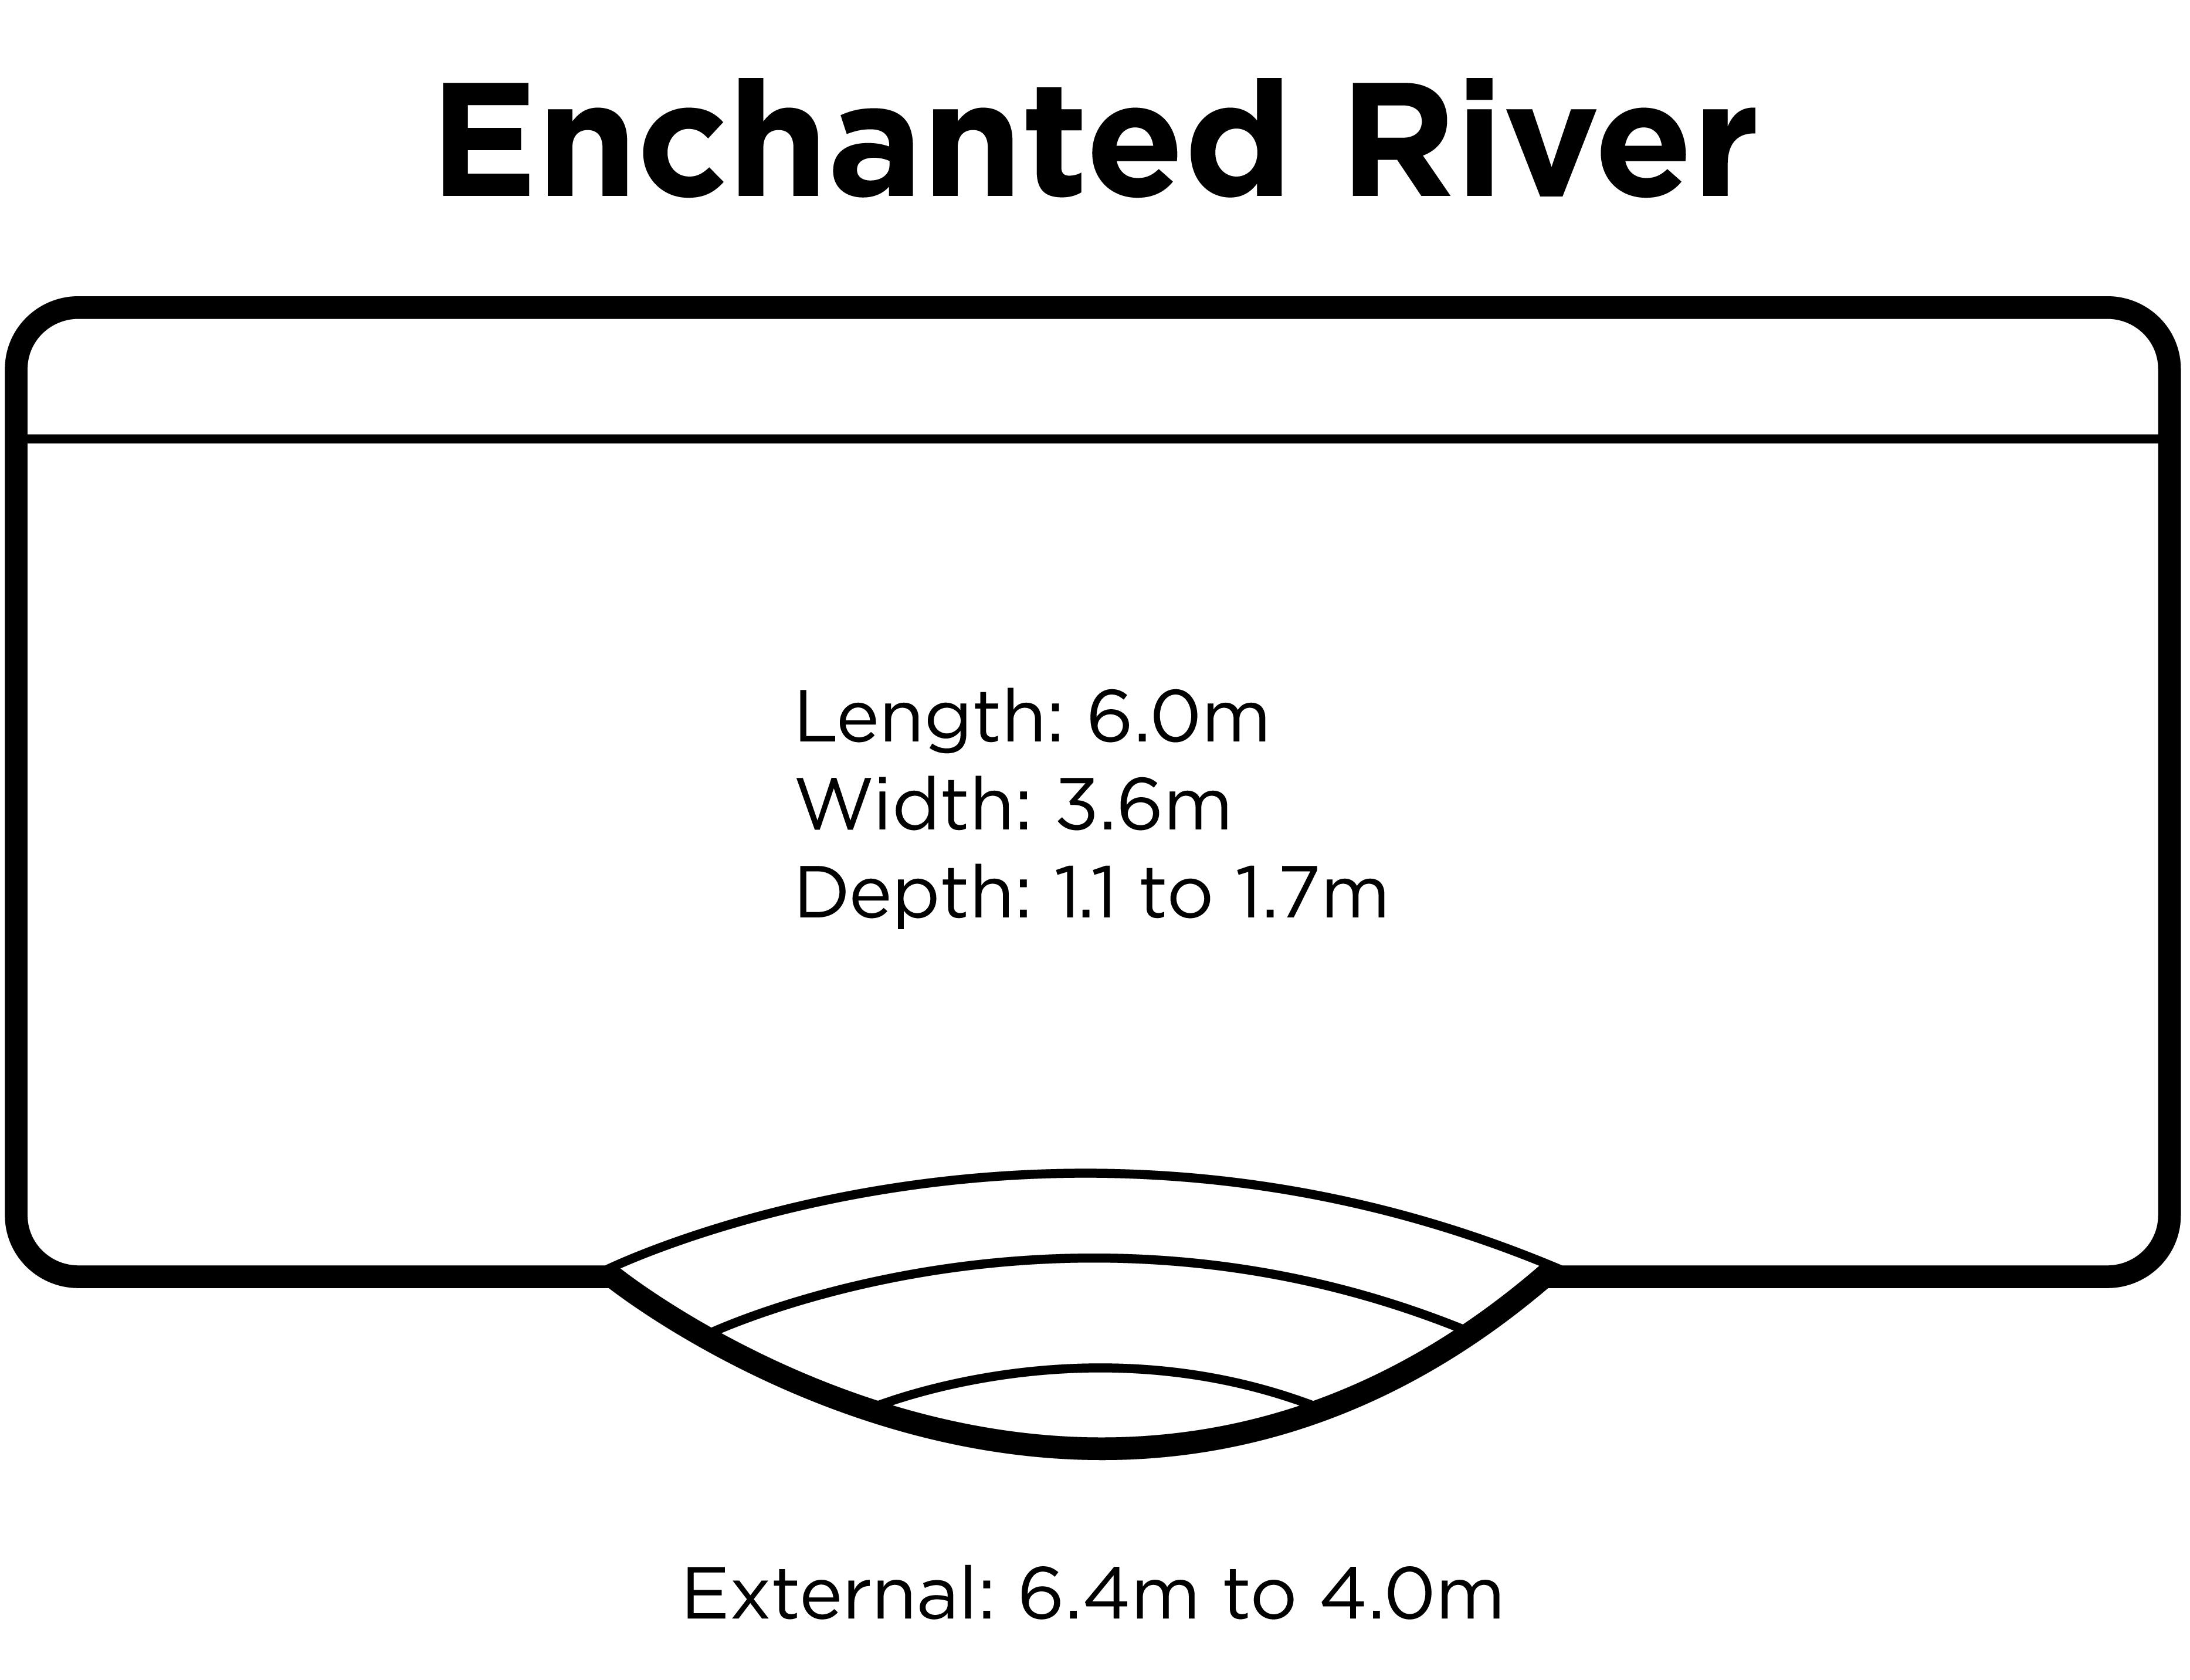 FINALEnchanted River